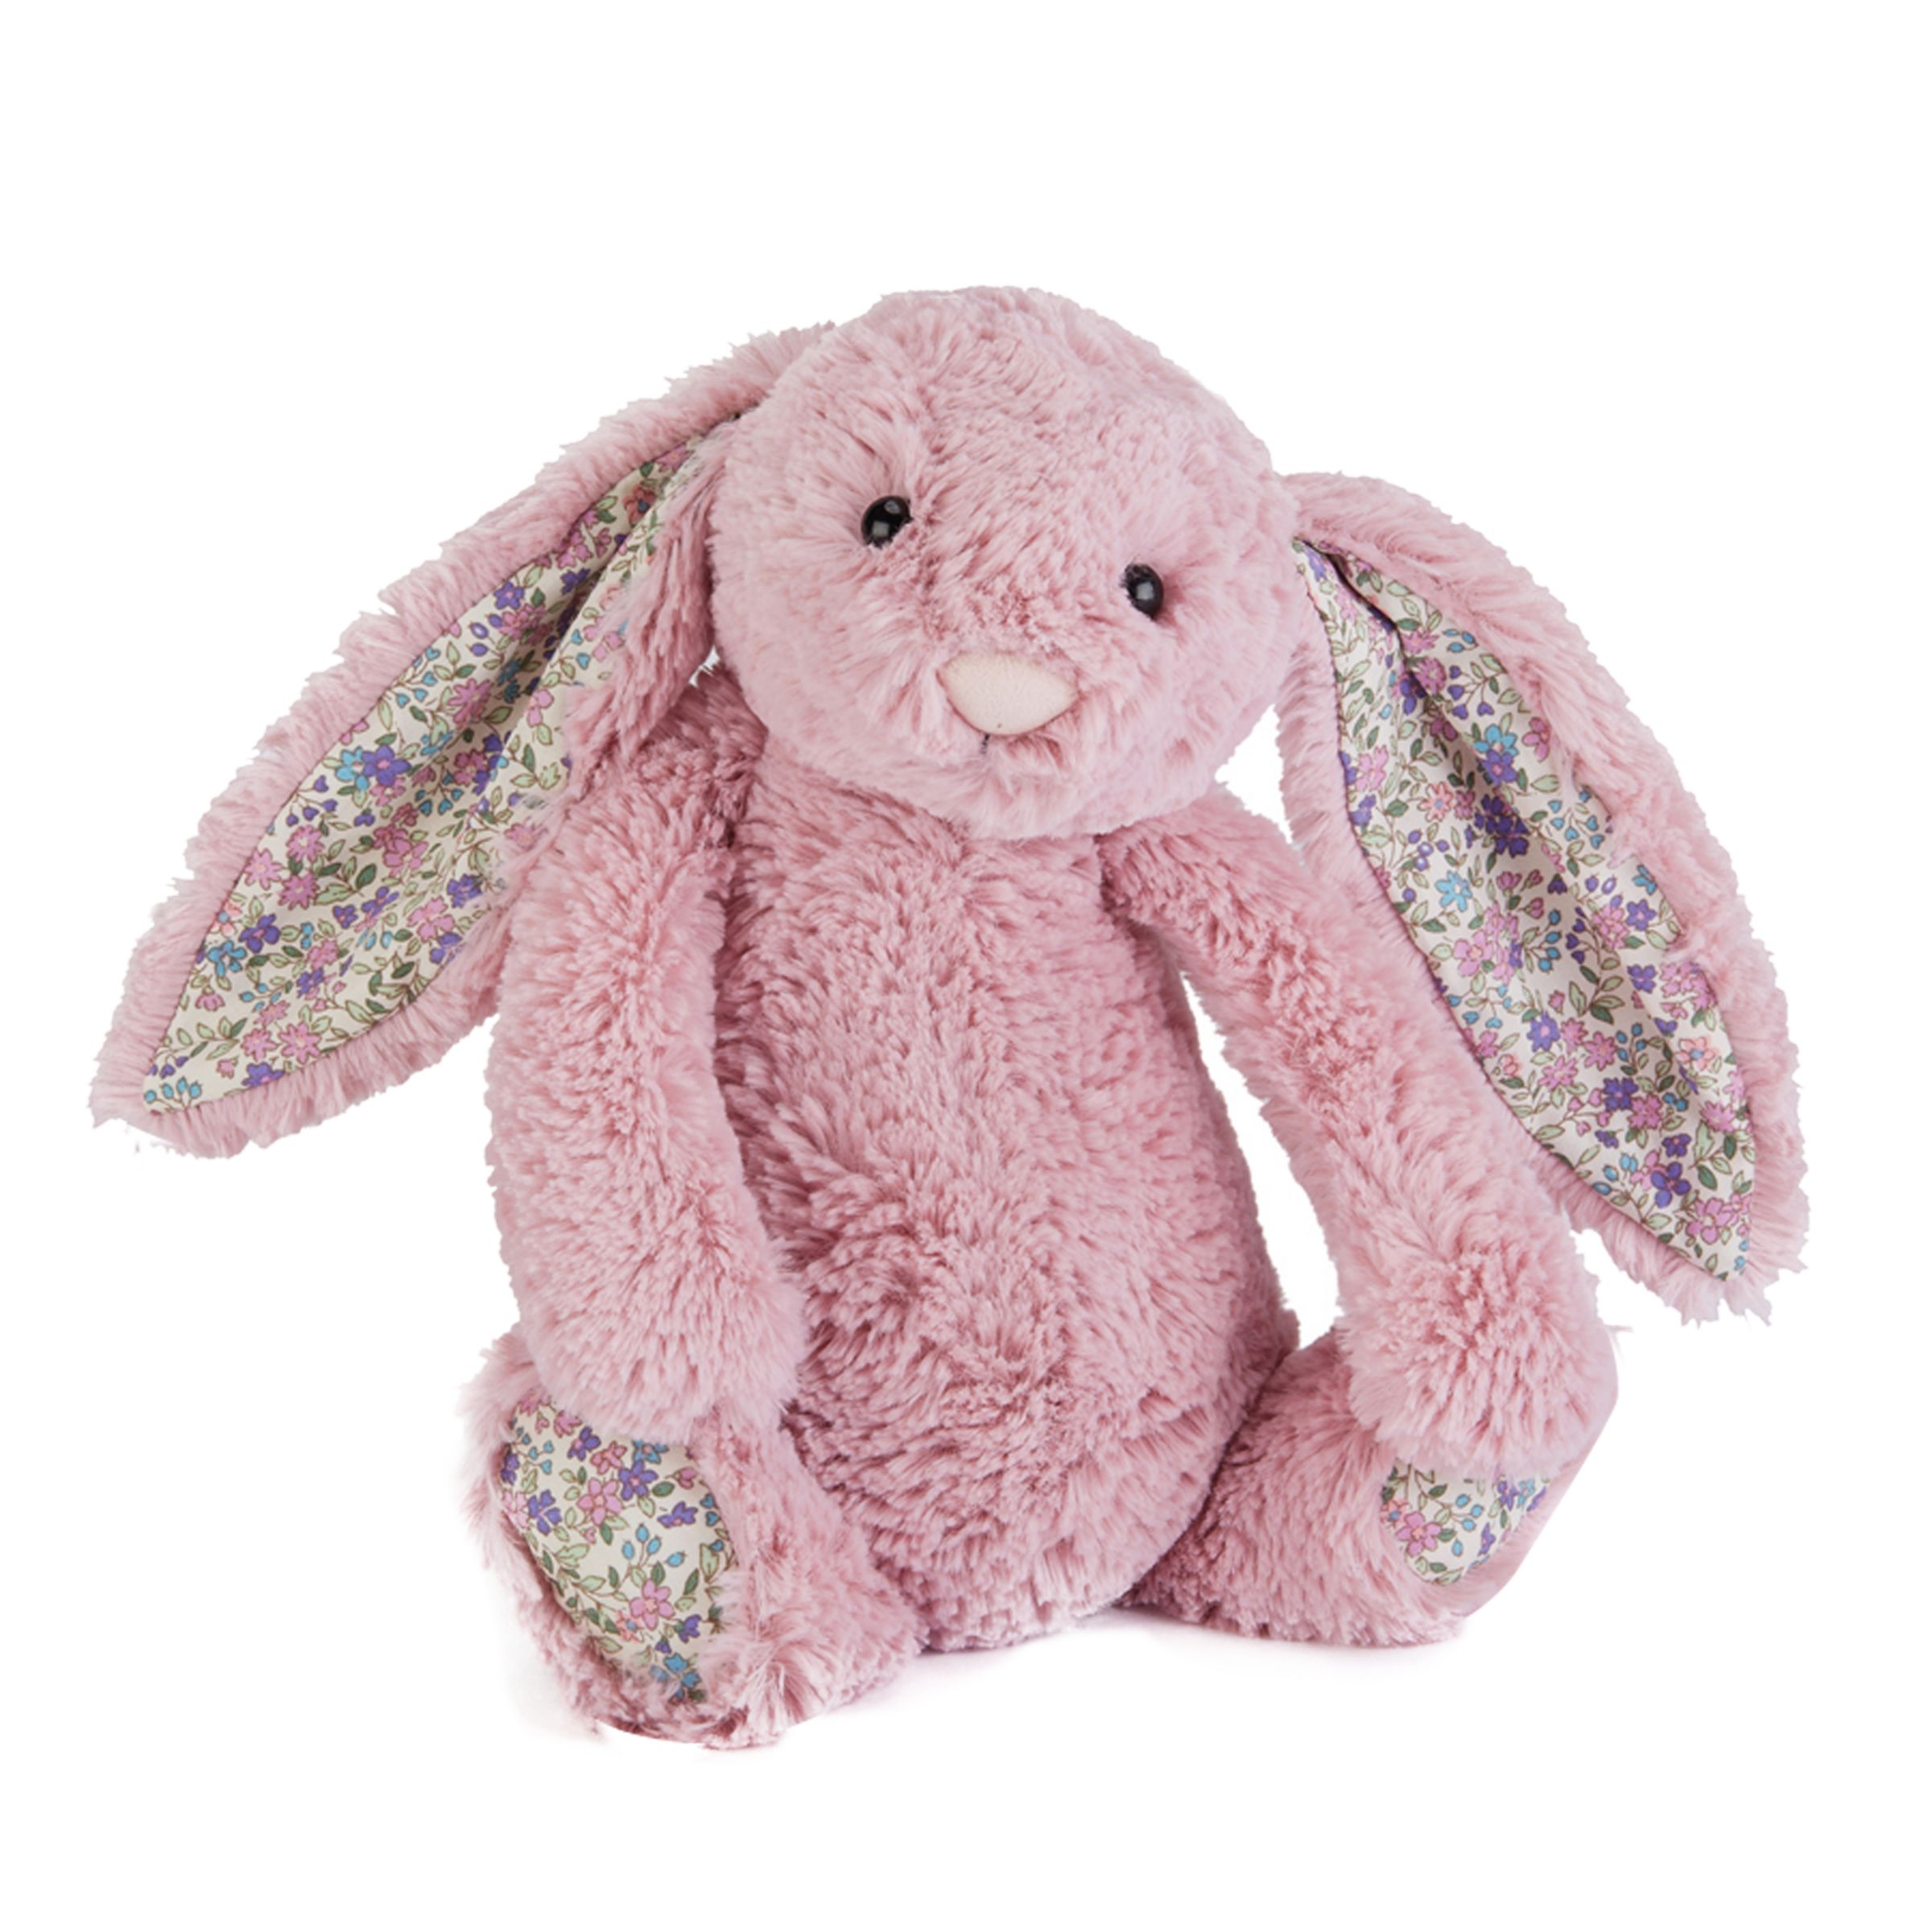 Jellycat Jellycat Blossom Bunny Soft Toy, Small